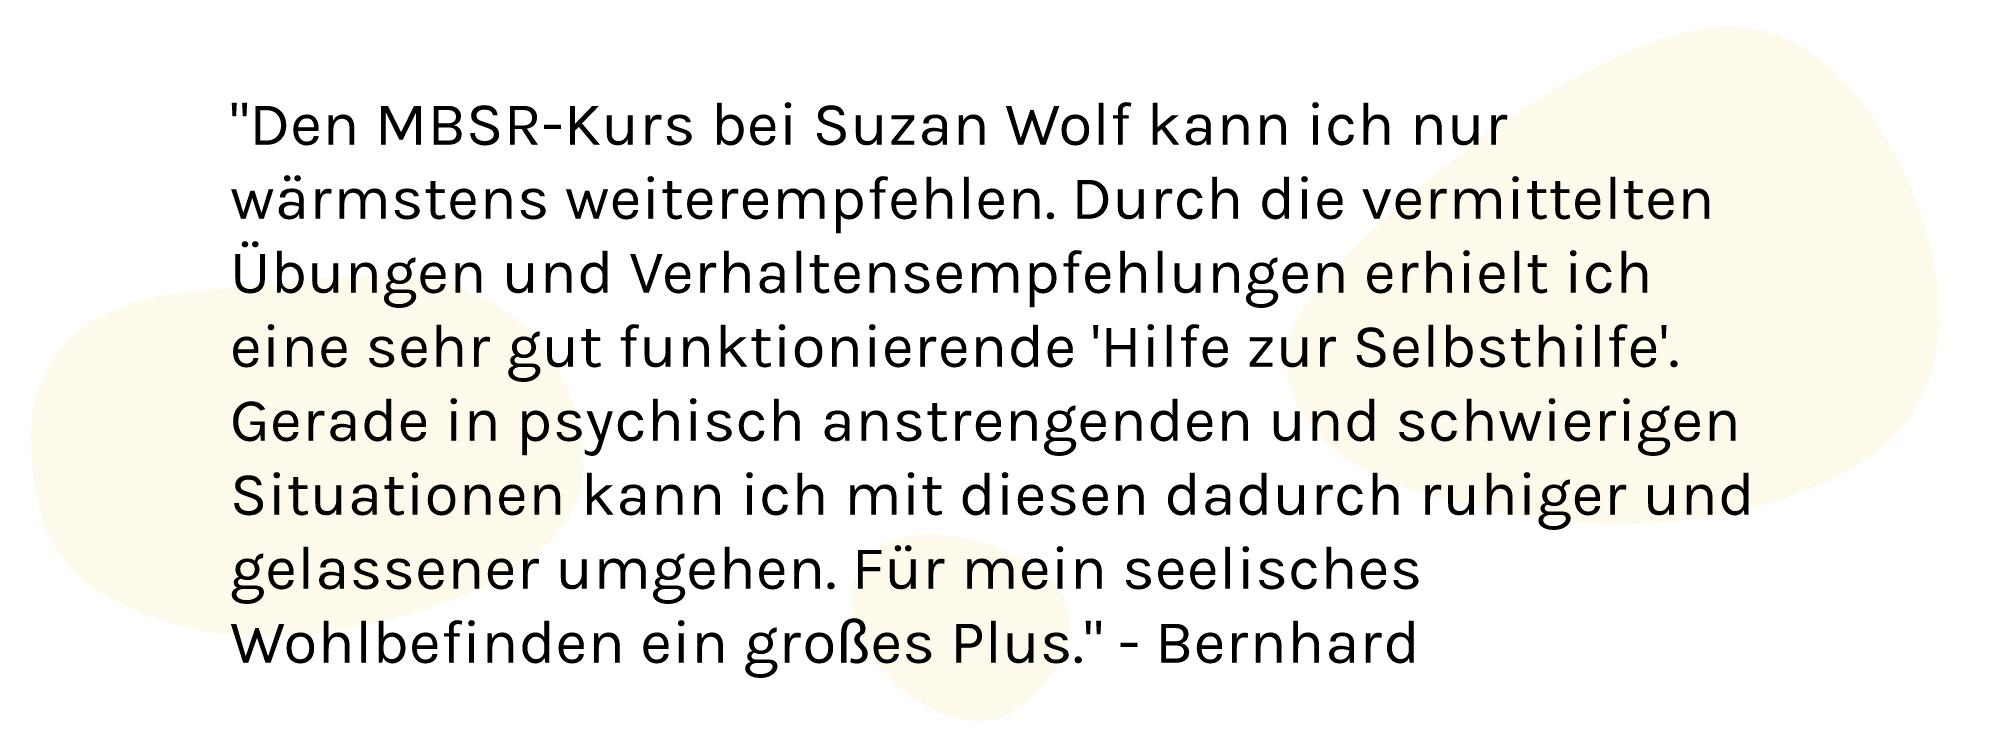 Bernhard-noresize